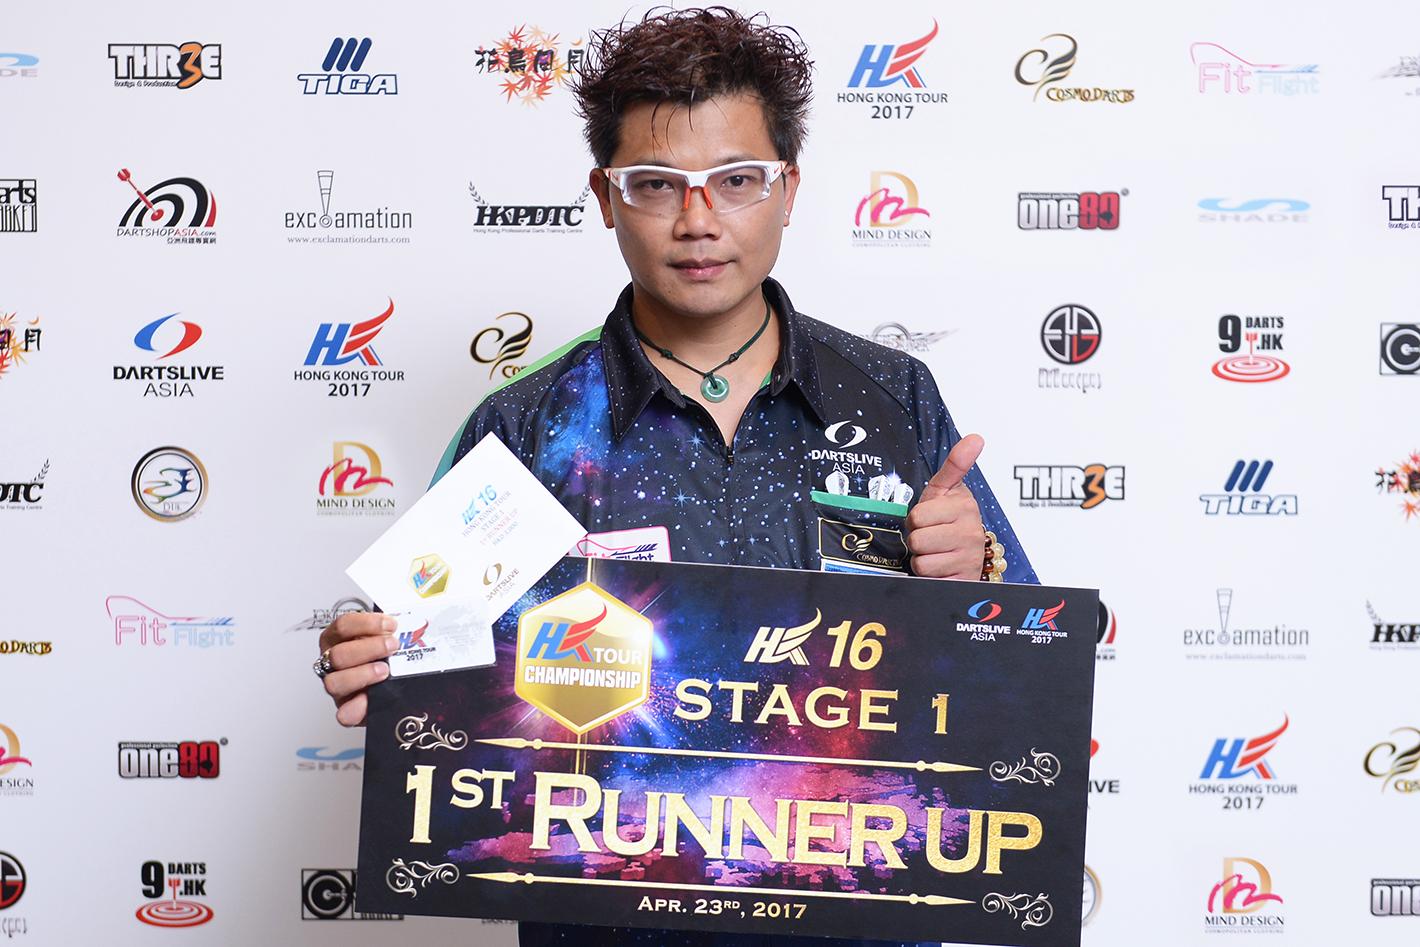 HKTCS_2017_HK16_Stage1_Result_ROYDEN_LAM